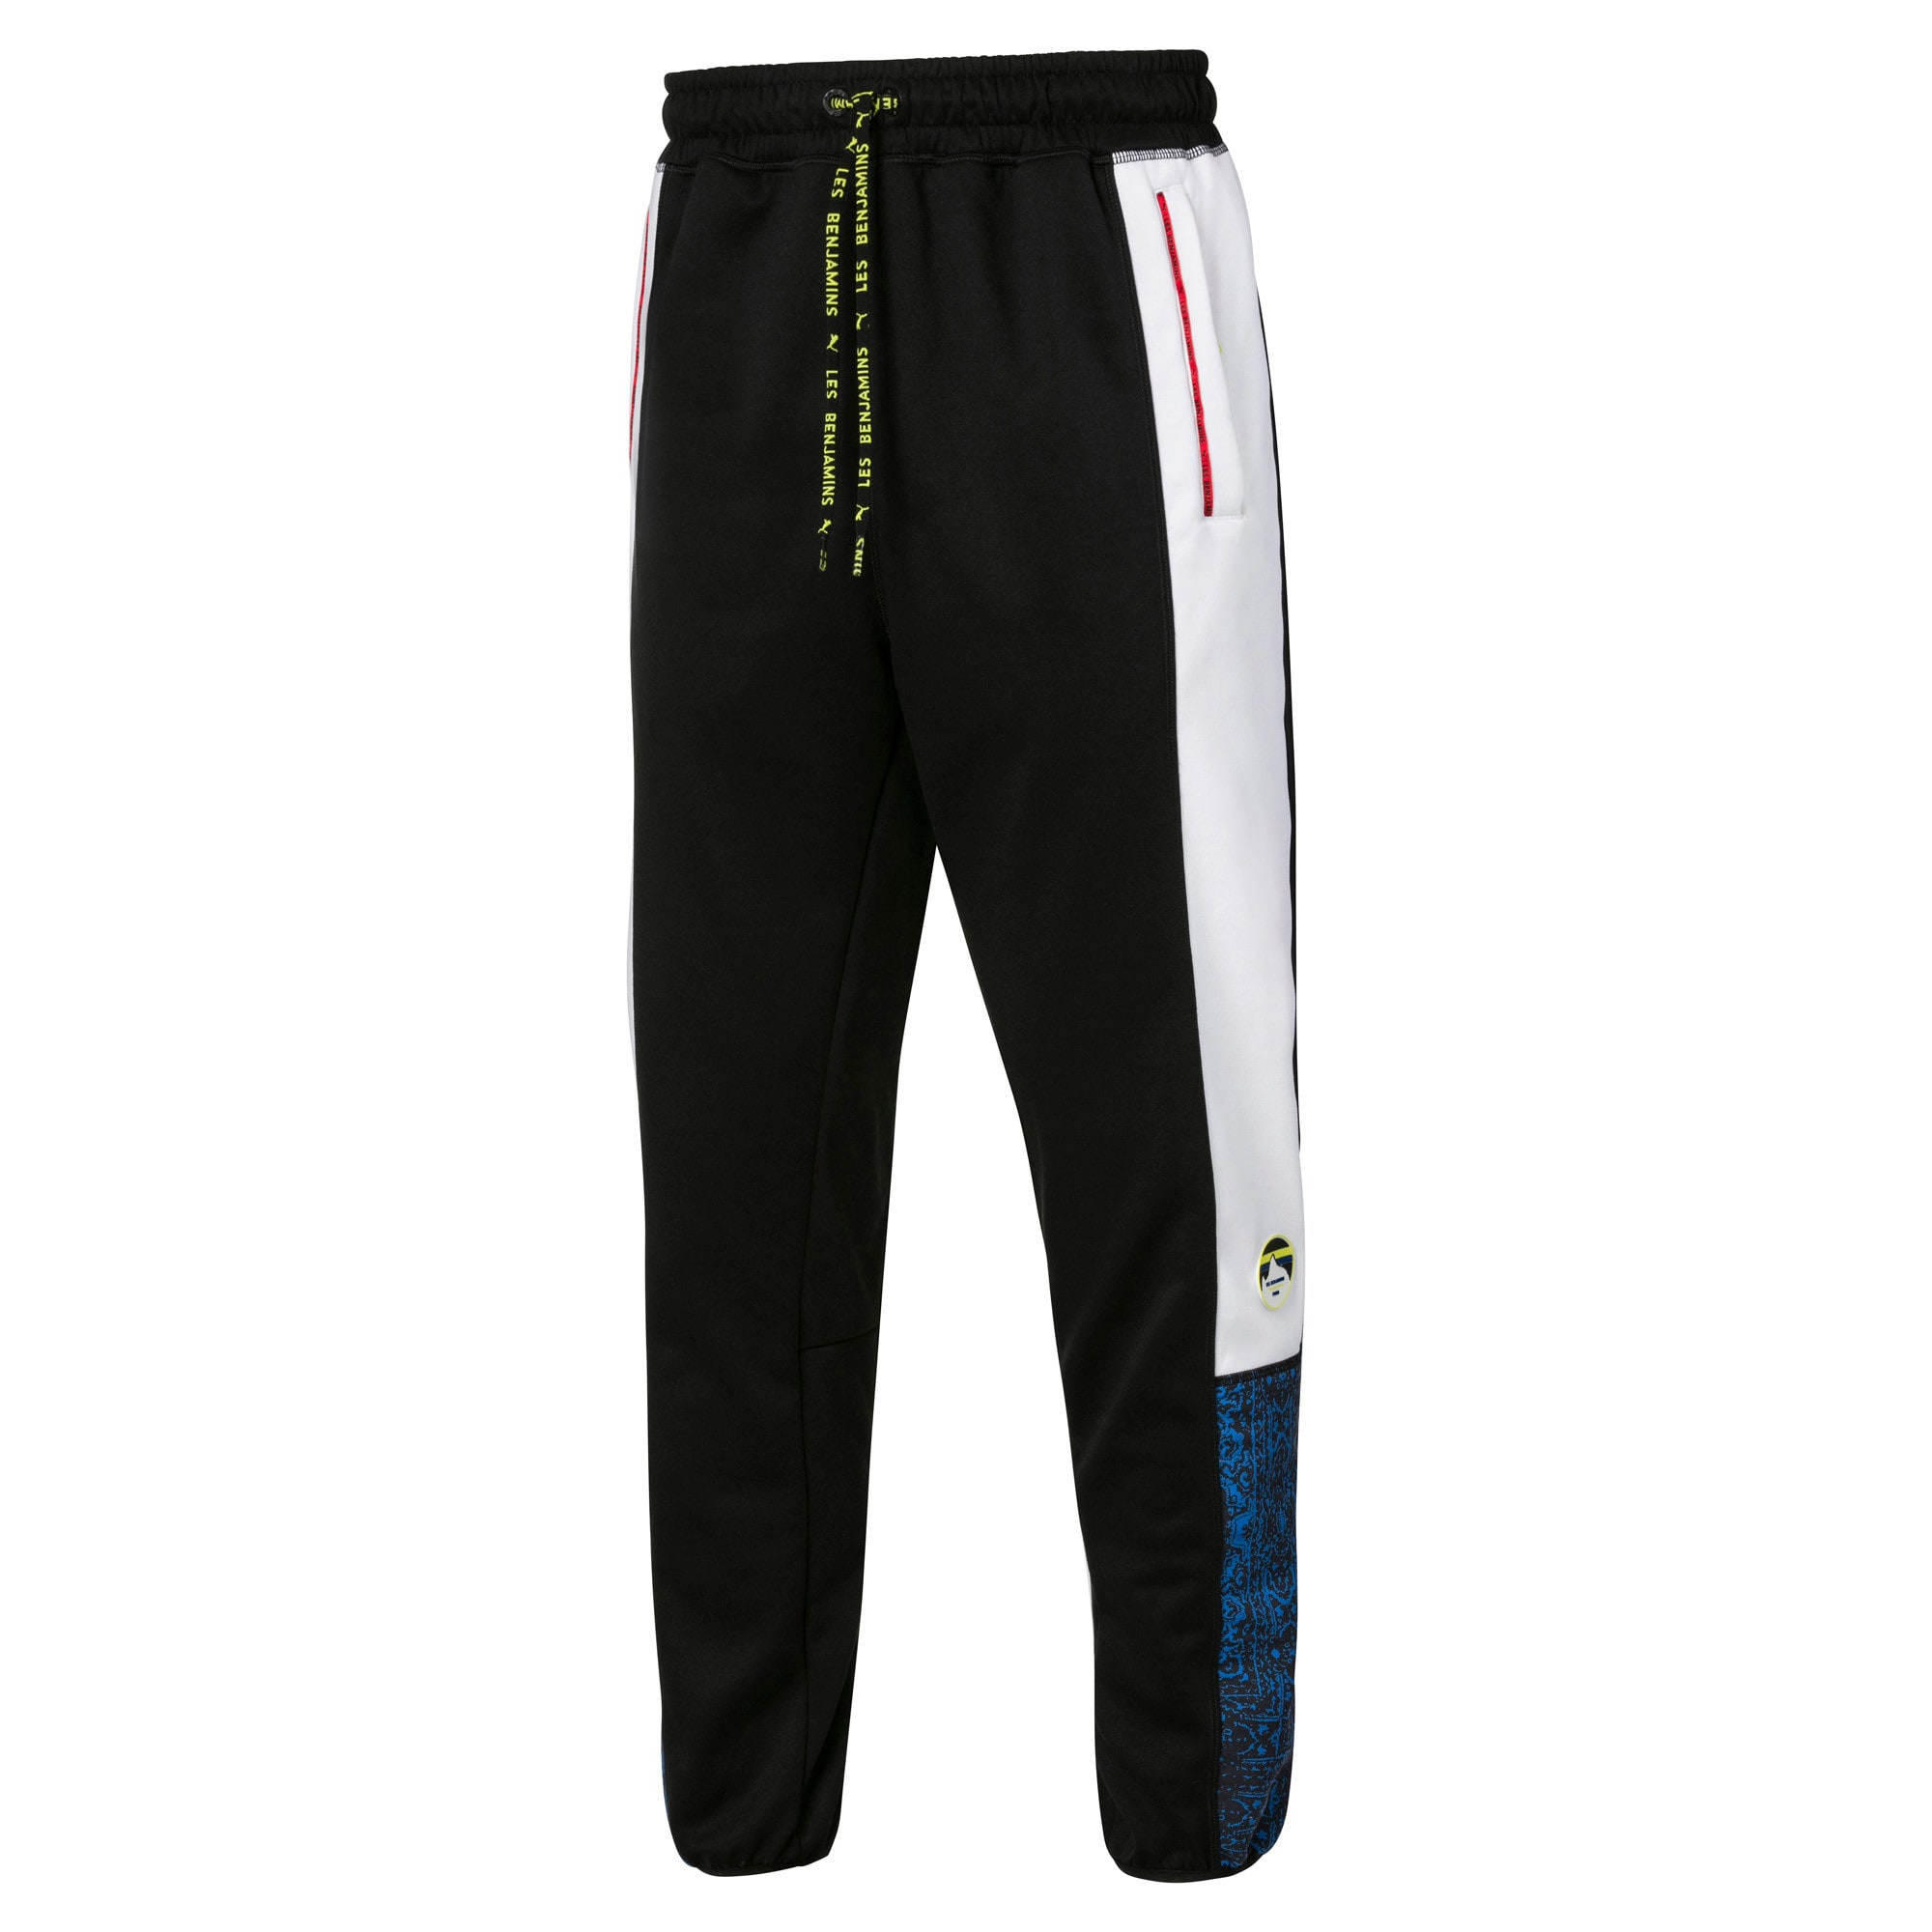 Miniatura 4 de Pantalones deportivos PUMA x LES BENJAMINS para hombre, Puma White, mediano